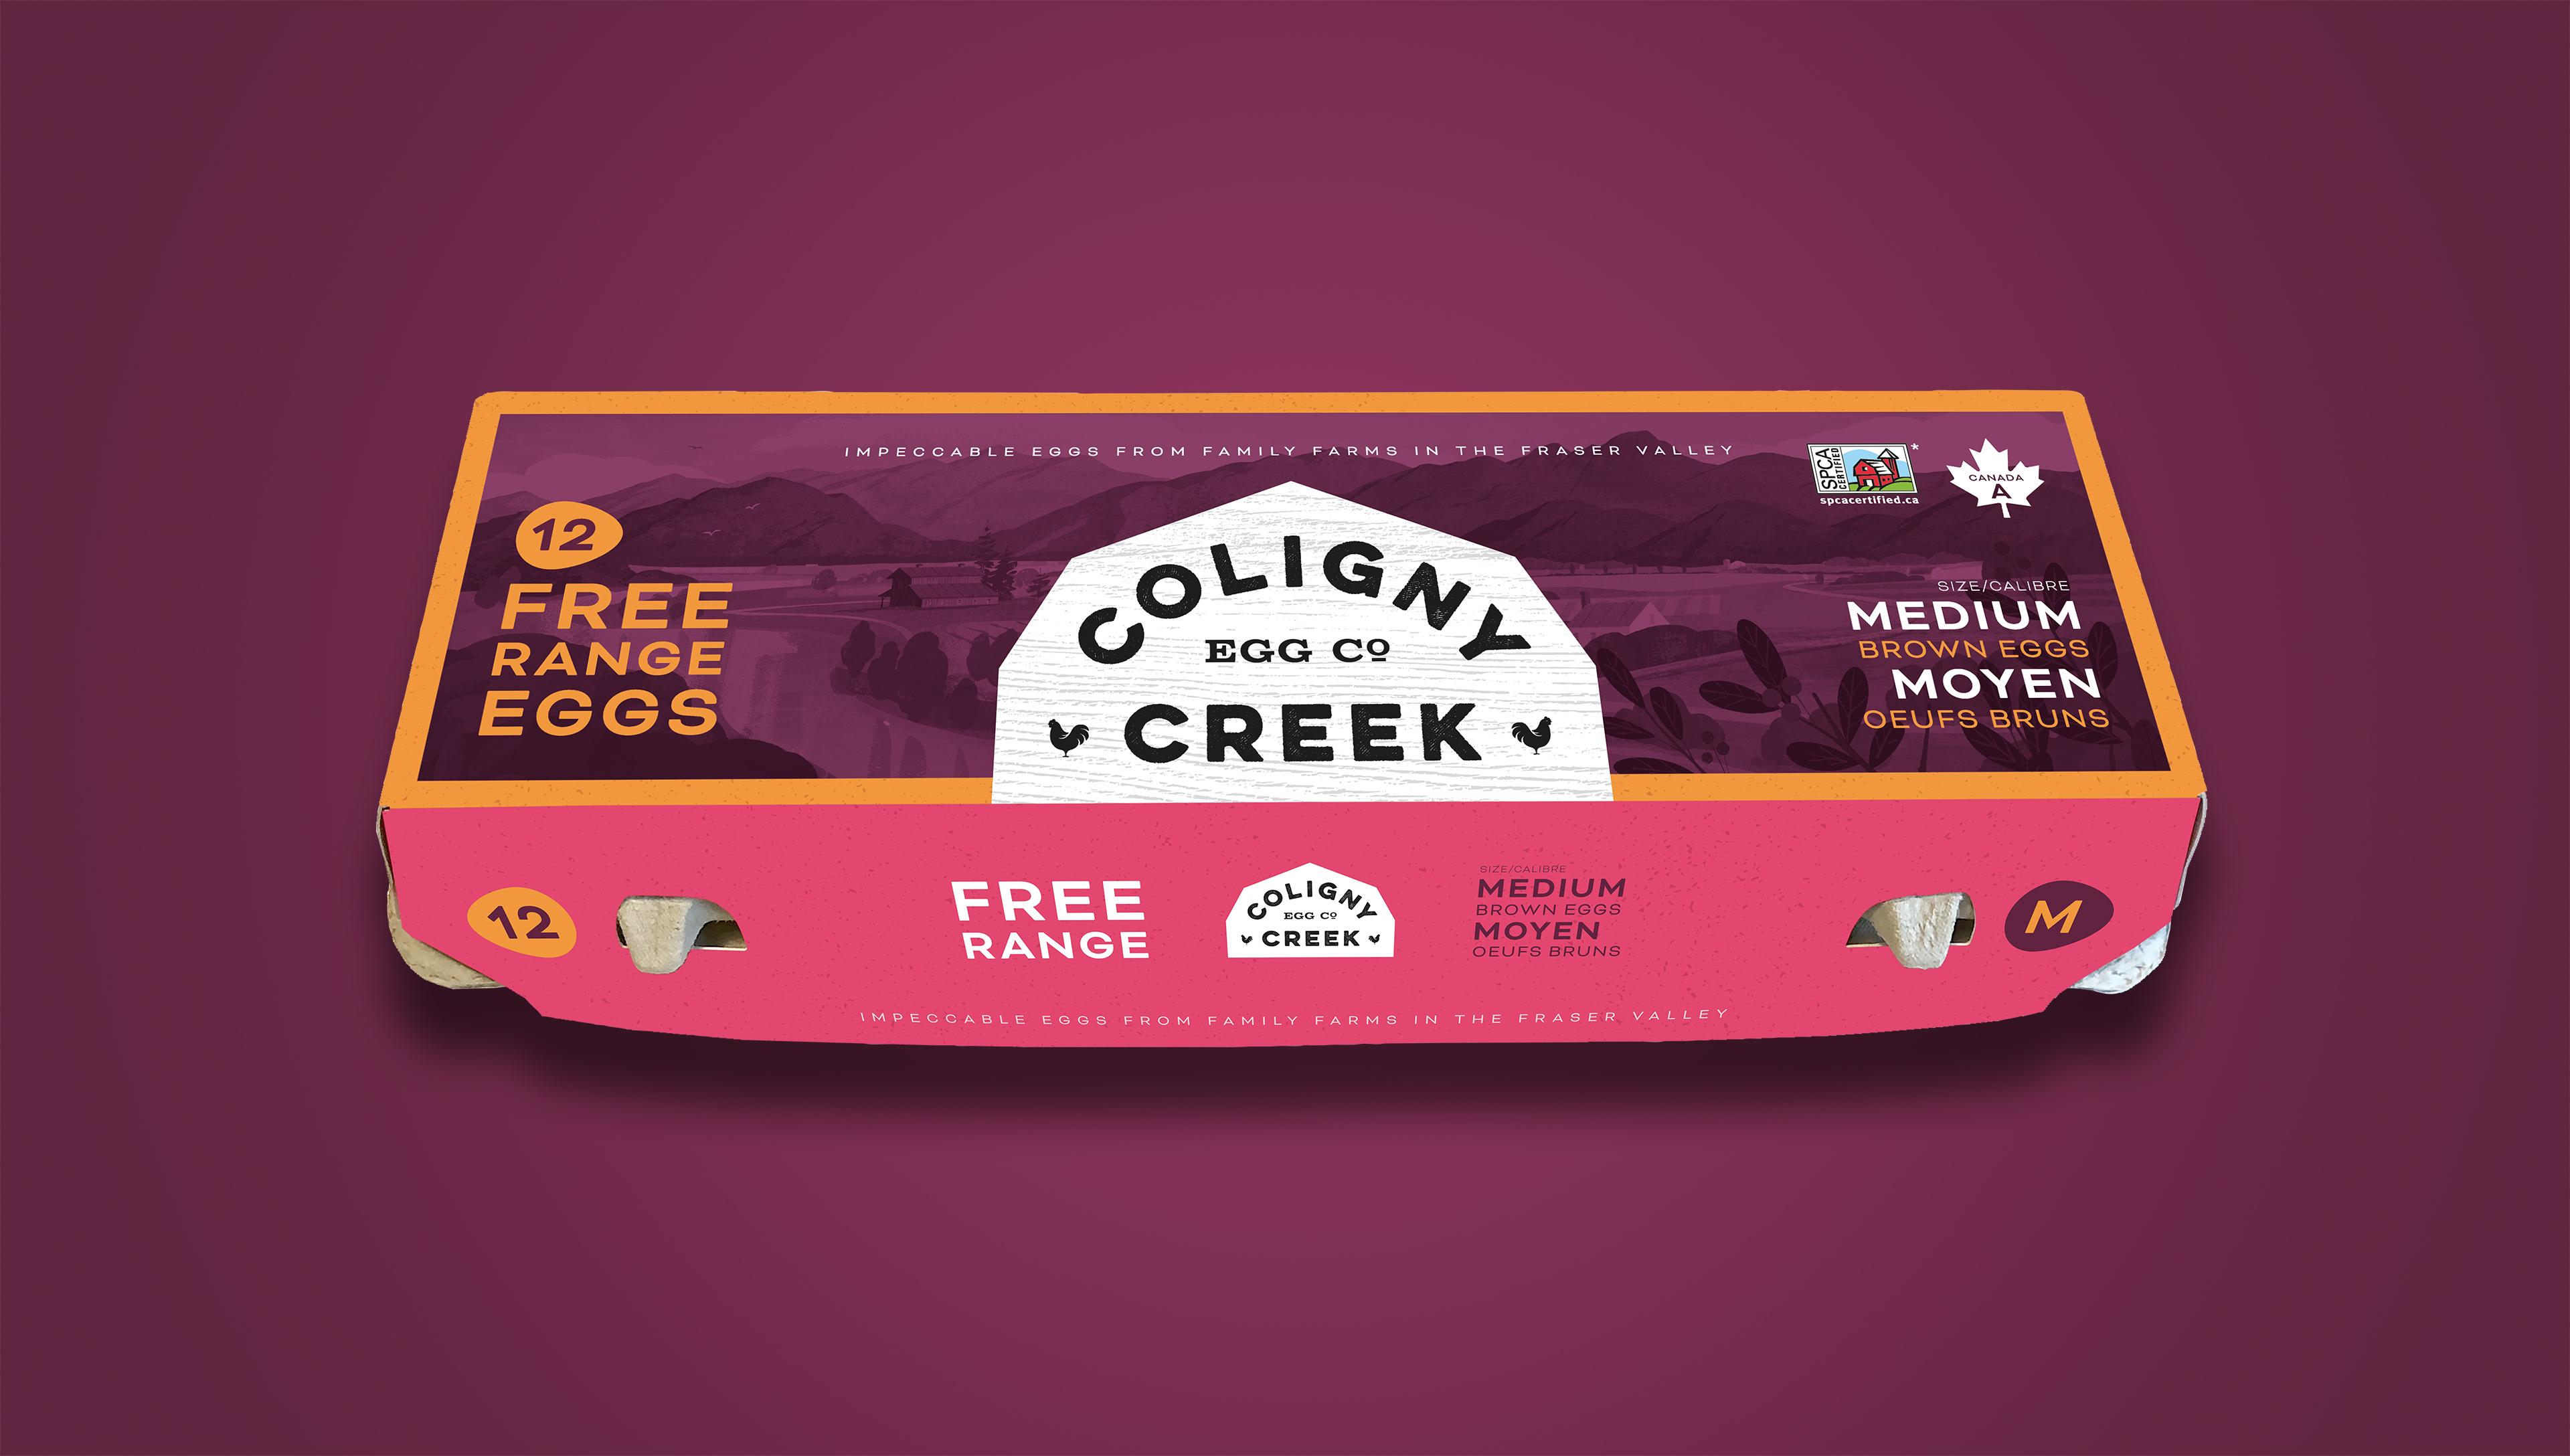 Dan O'Leary Design Branding and Packaging Design for Coligny Creek Egg Co.